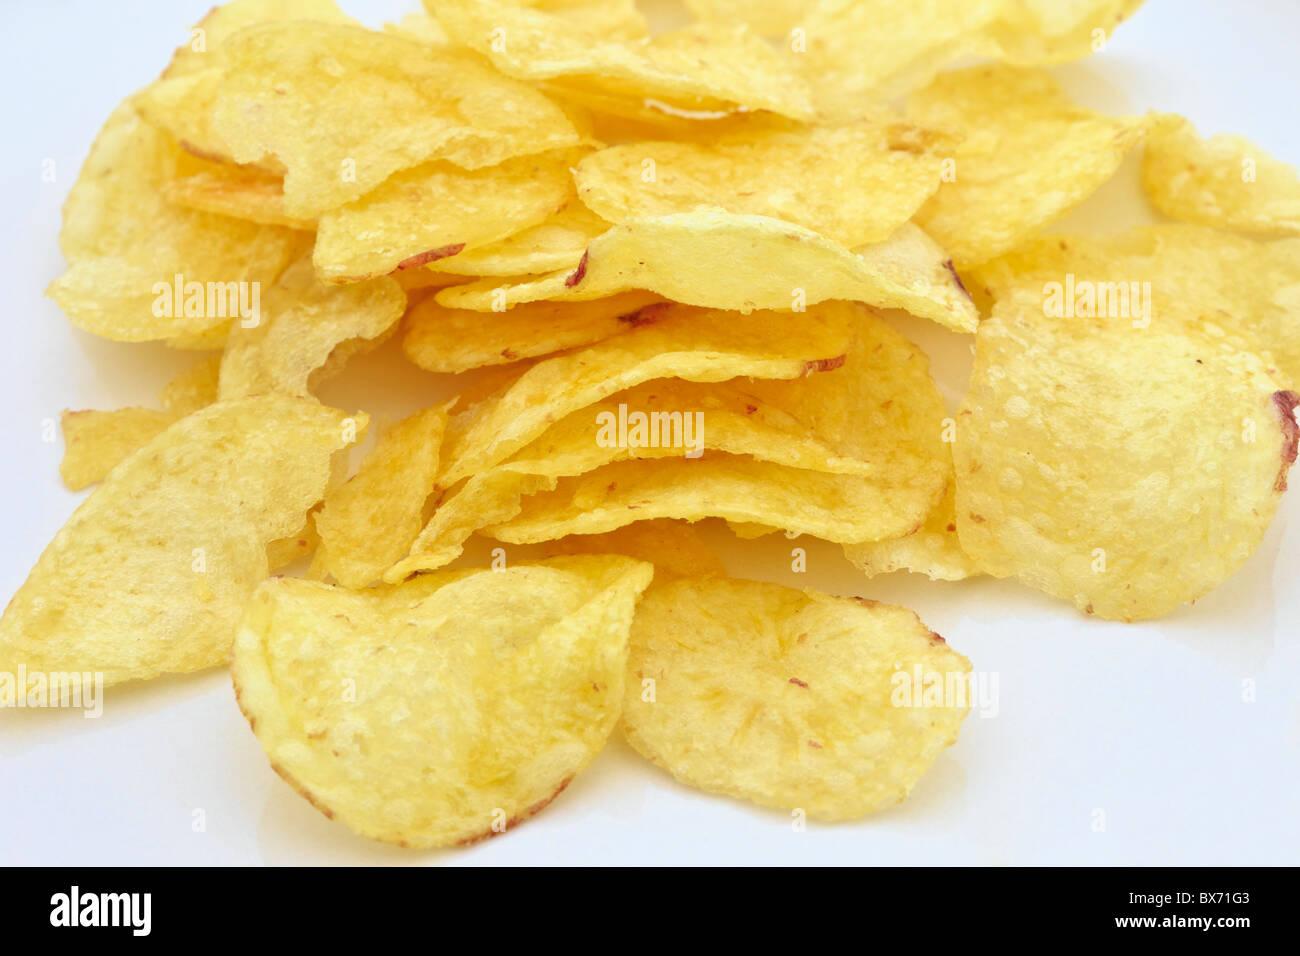 Pile of potato crisps on a plain white background - Stock Image